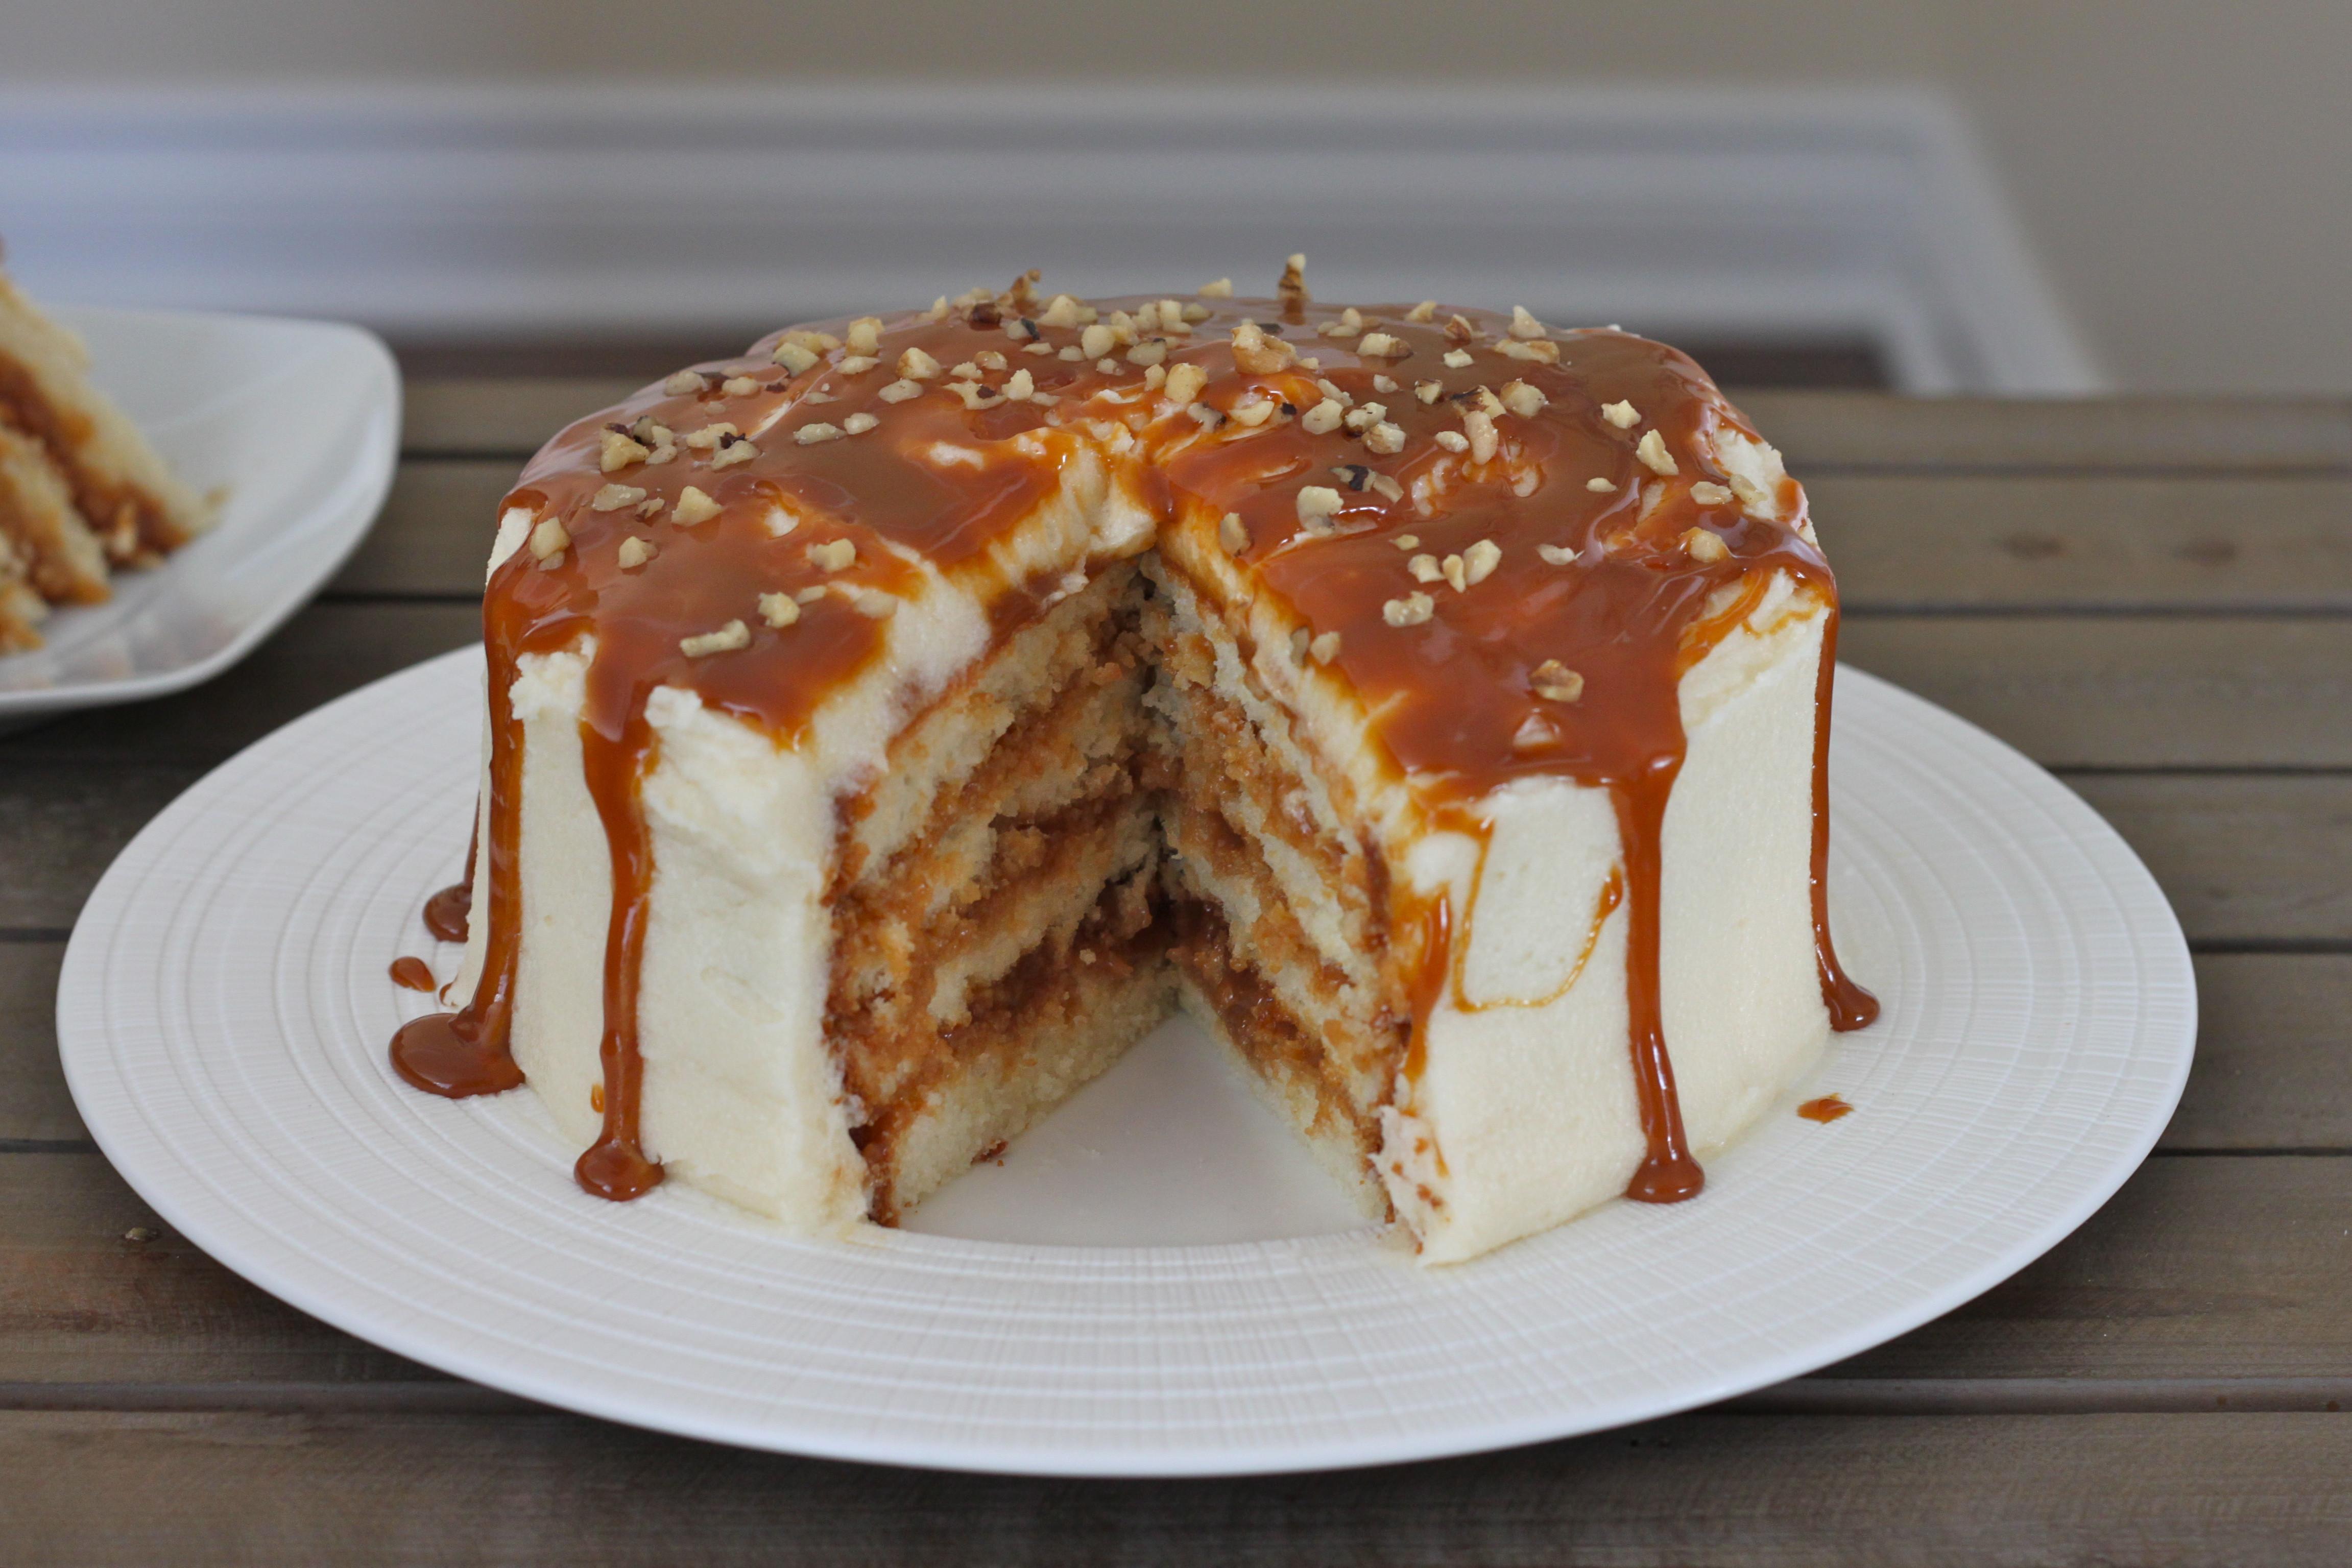 Dulce De Leche Desserts  Dulce de Leche Vanilla Cake – I Adore Food